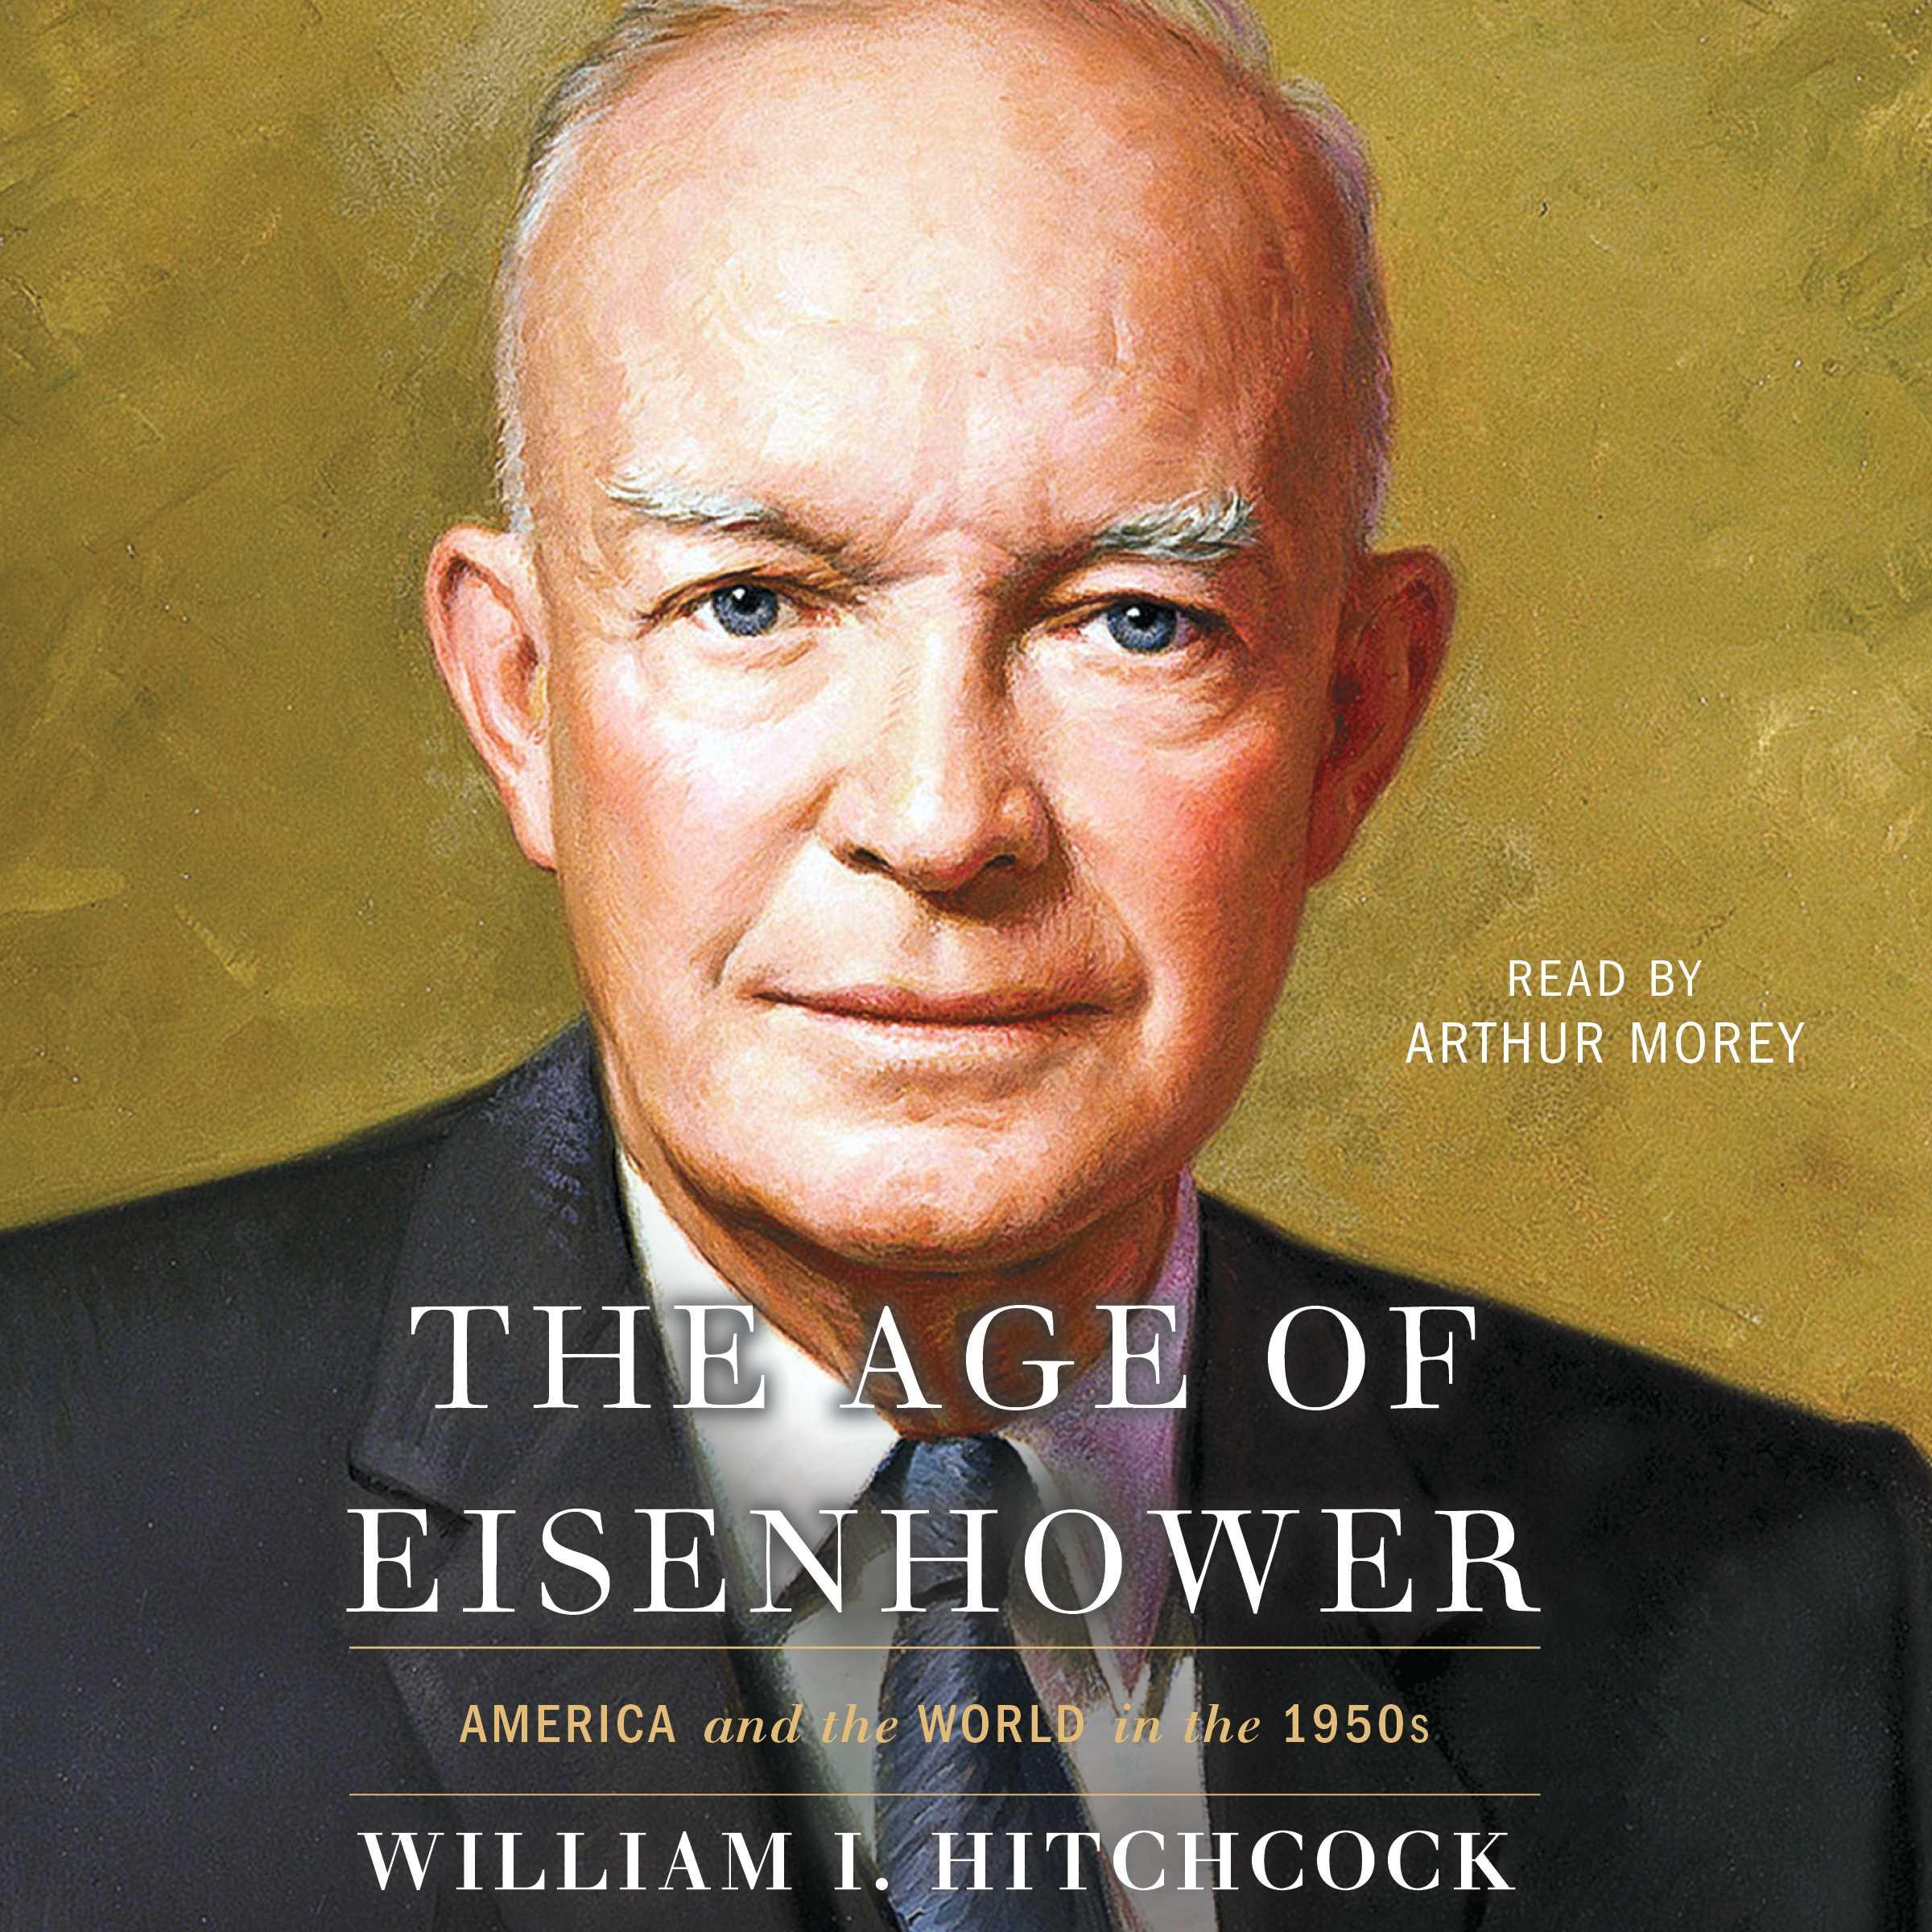 The age of eisenhower 9781508254478 hr